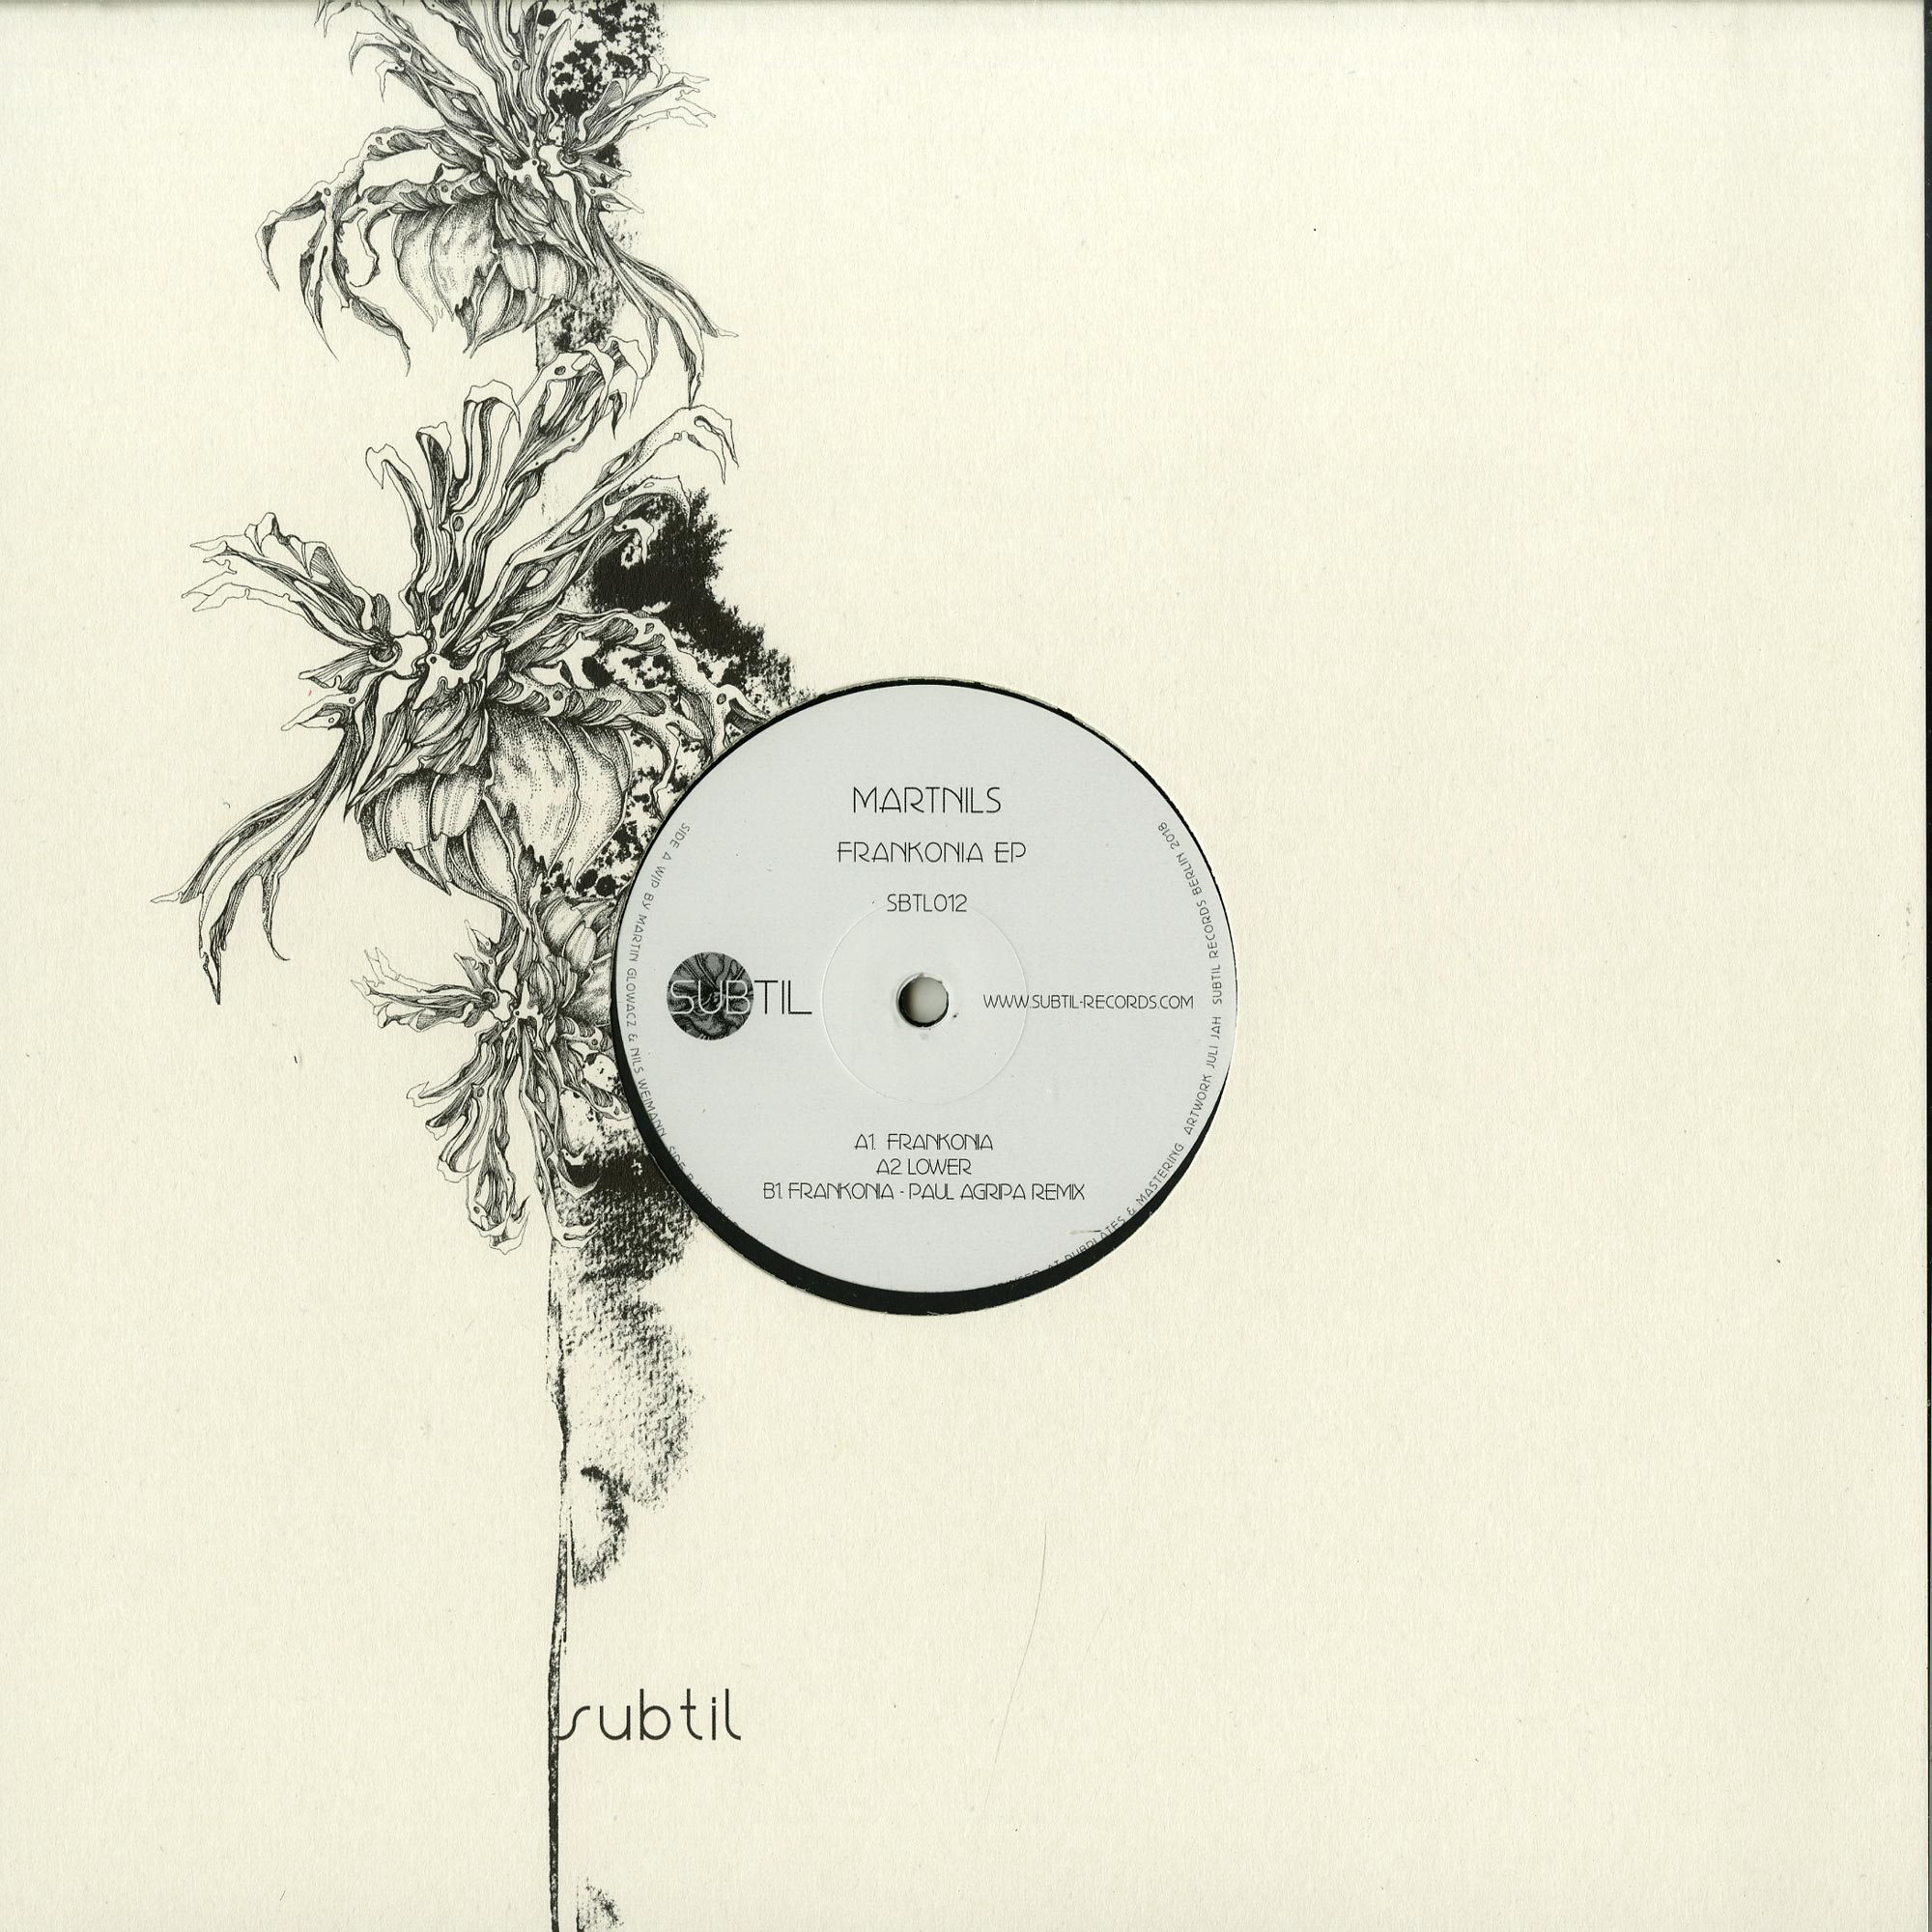 MartiNils - FRANKONIA EP